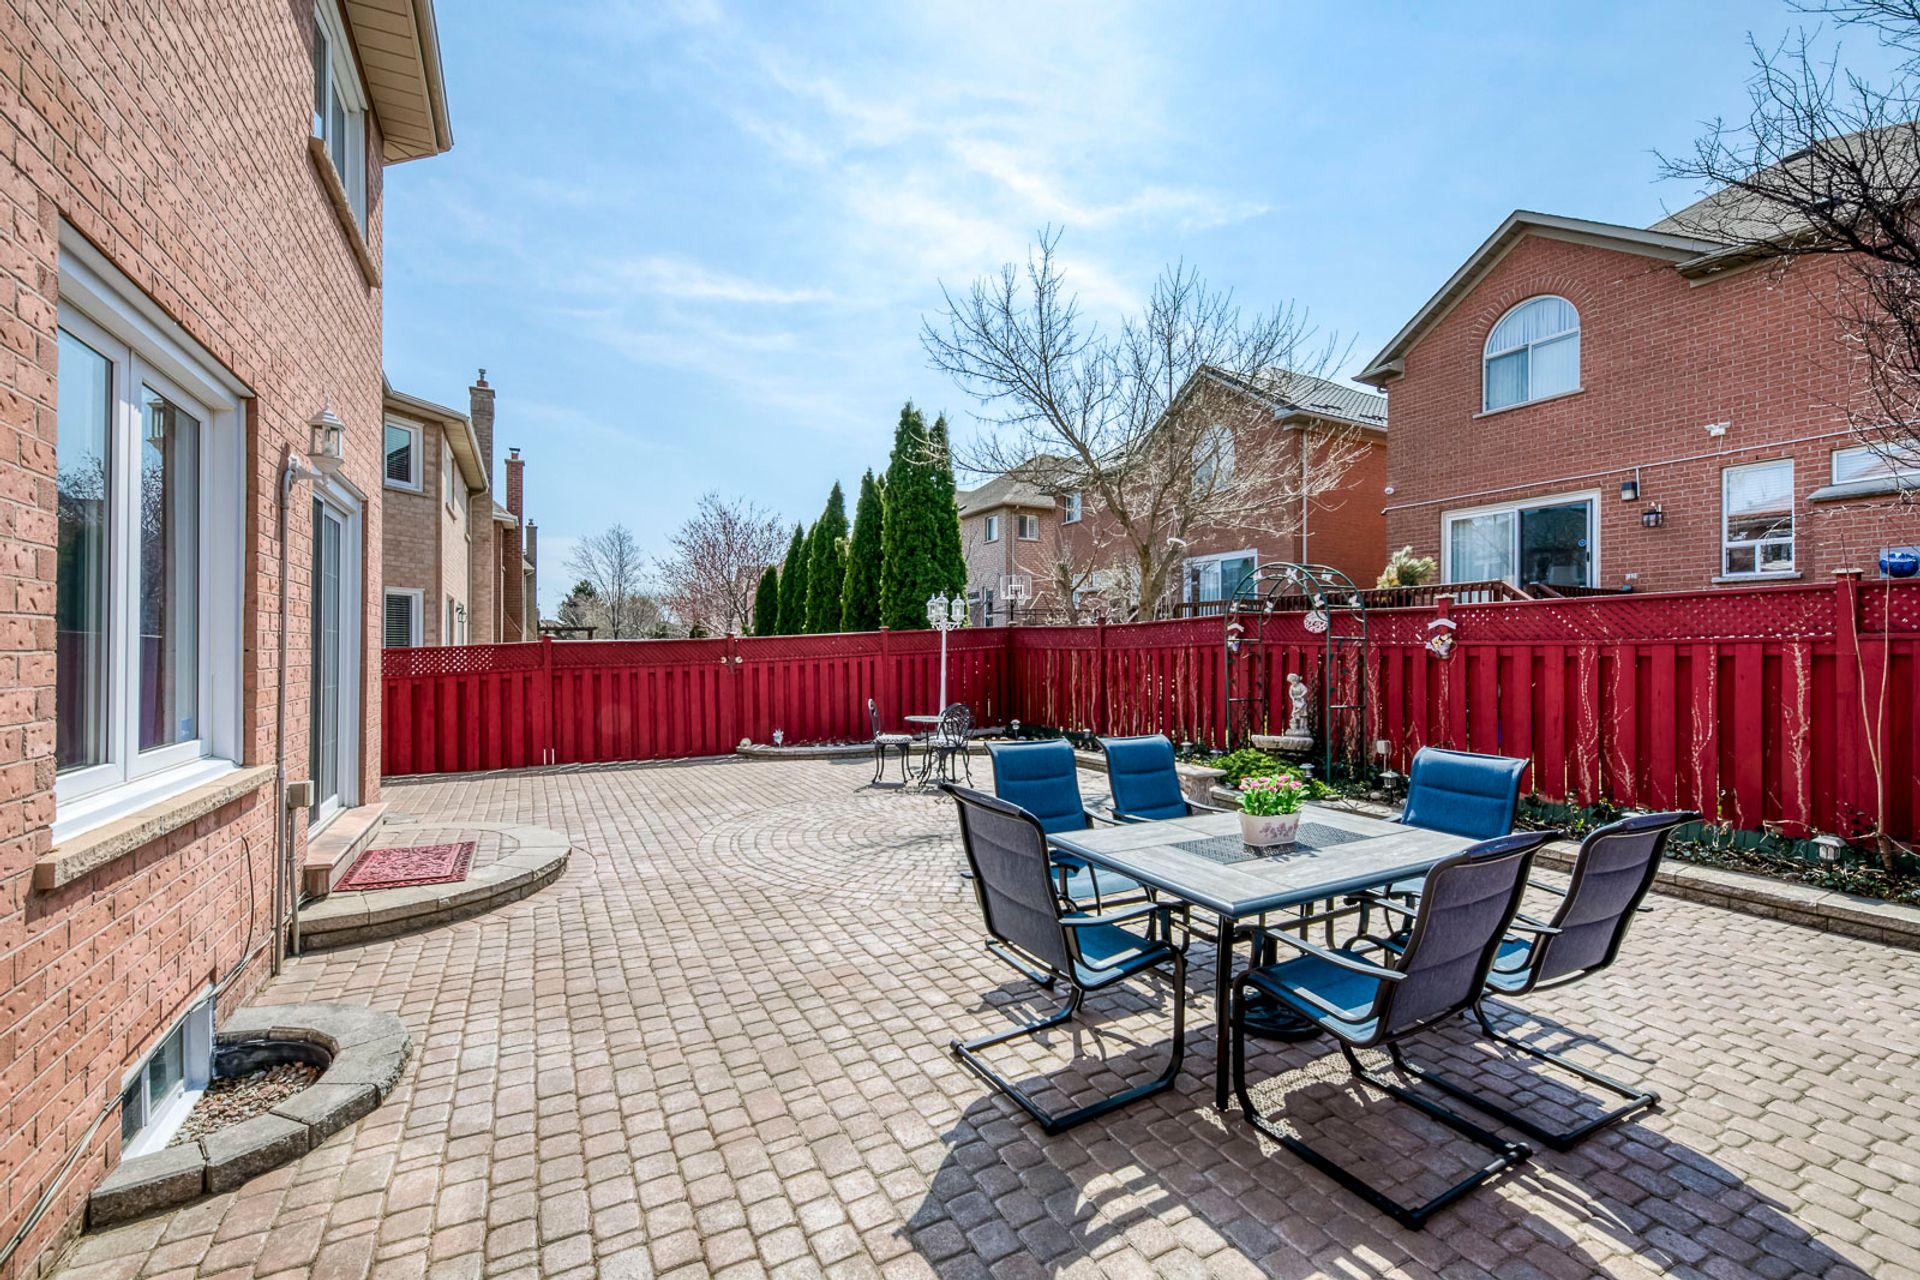 Backyard - 5156 Heatherleigh Ave, Mississauga - Elite3 & Team at 5156 Heatherleigh Avenue, East Credit, Mississauga